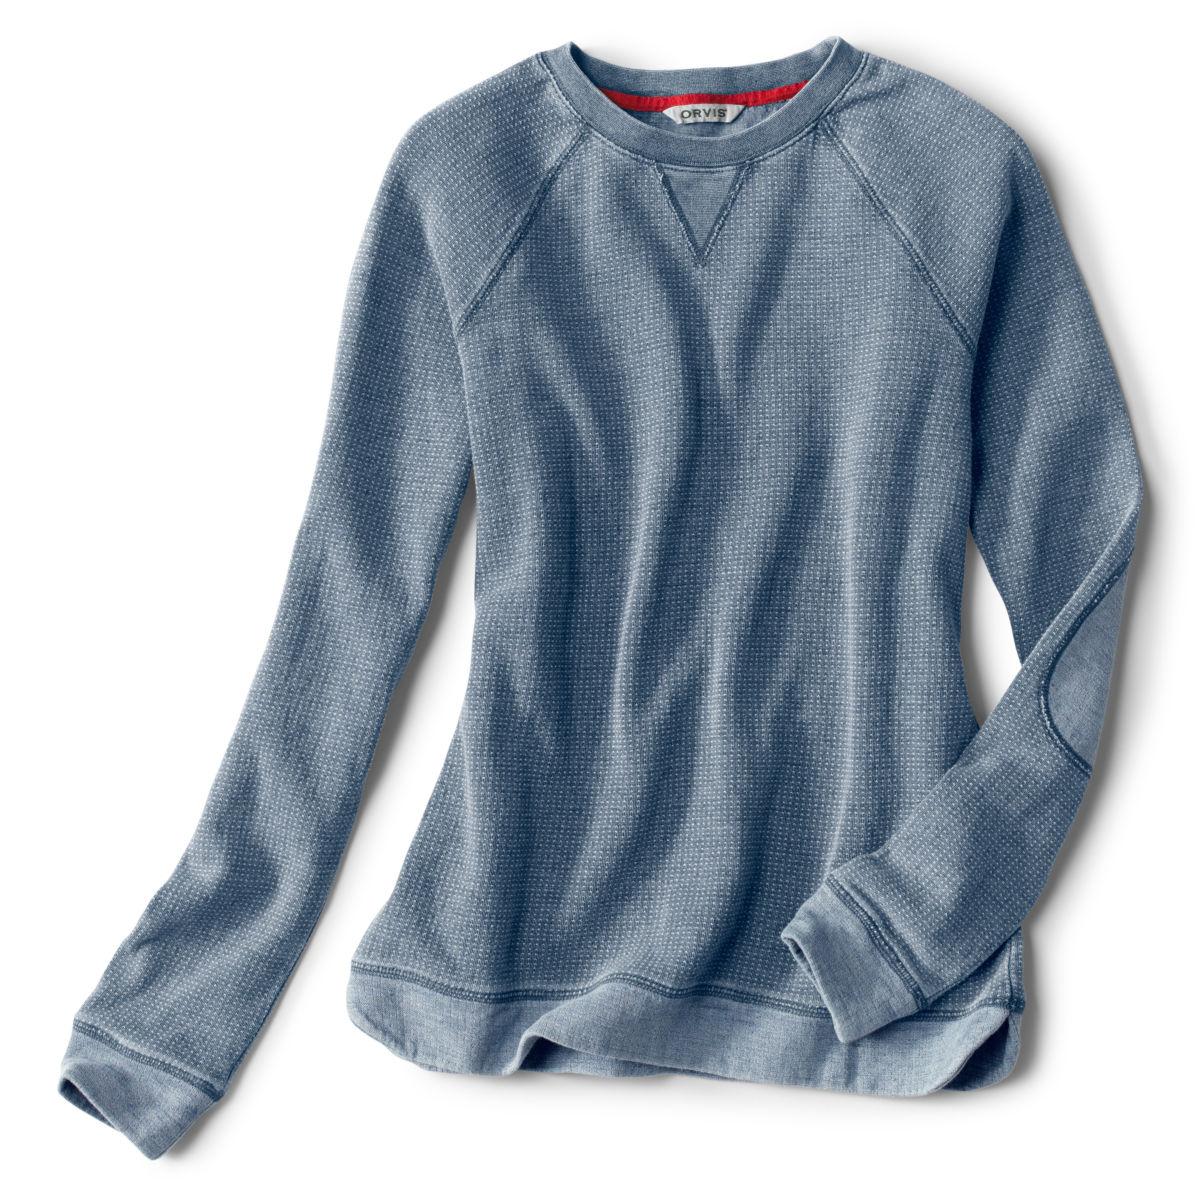 Washed Bird's-Eye Crew Sweatshirt - INDIGOimage number 0